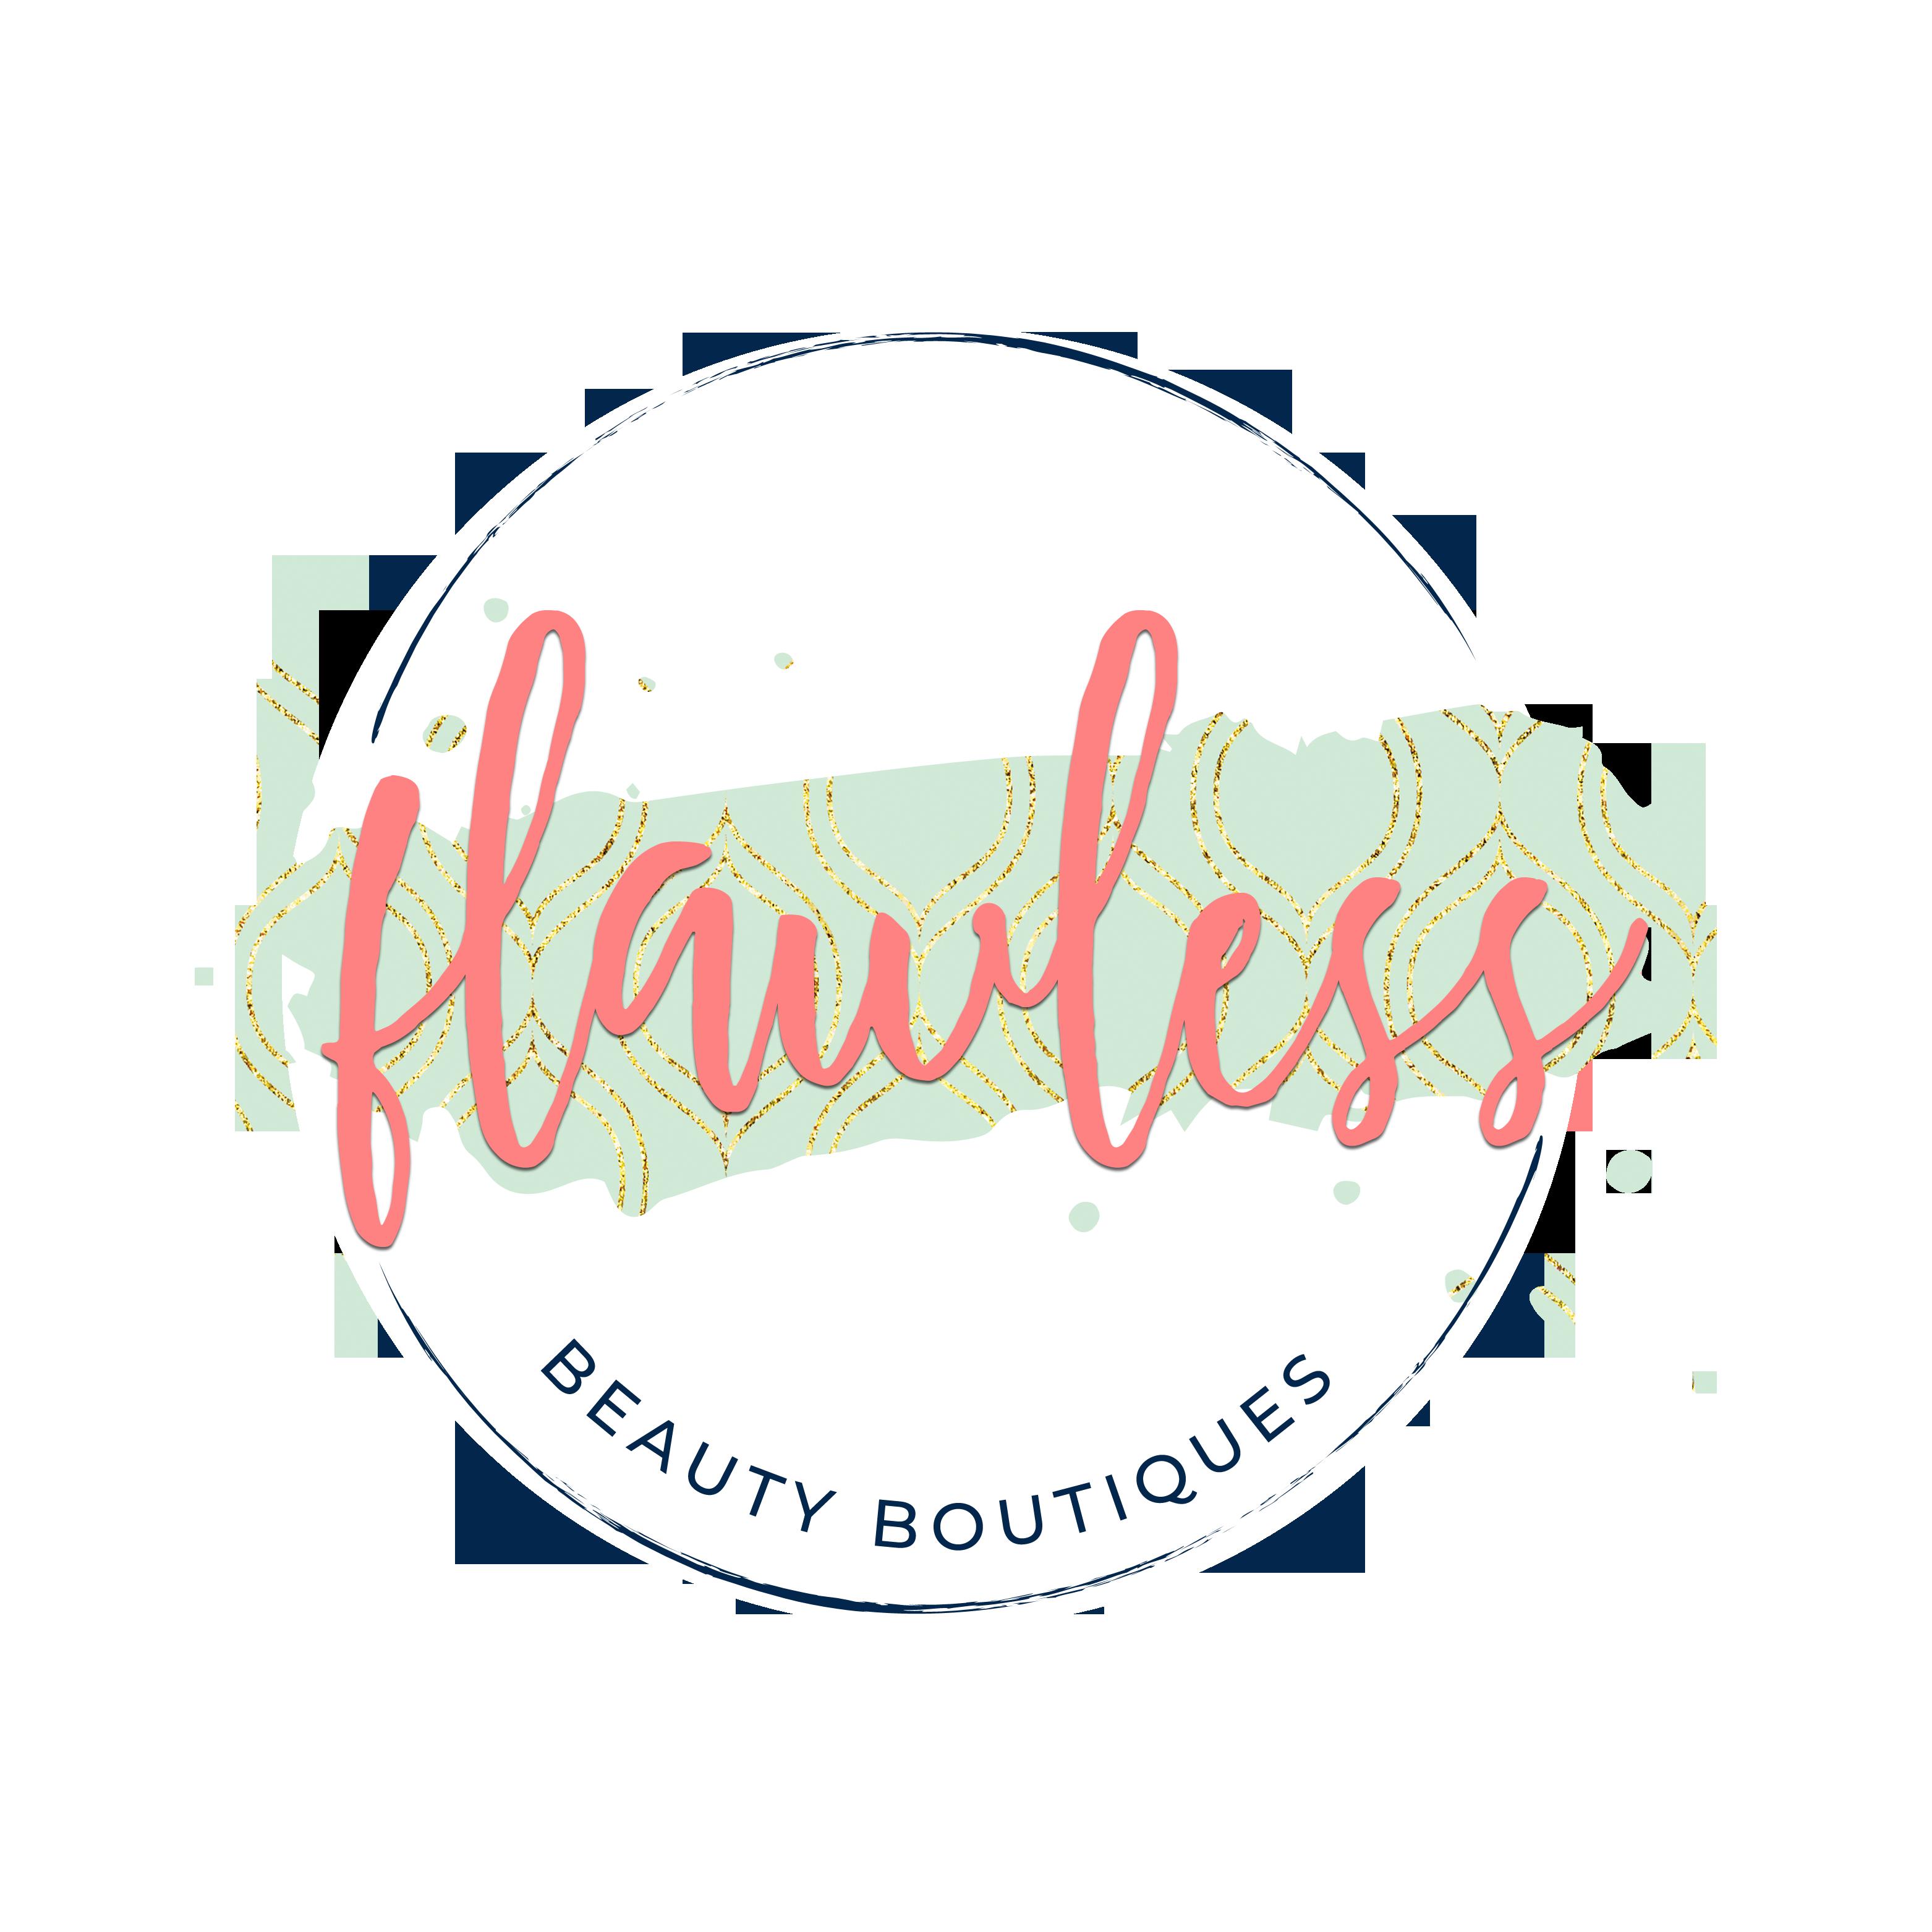 flawless9.2